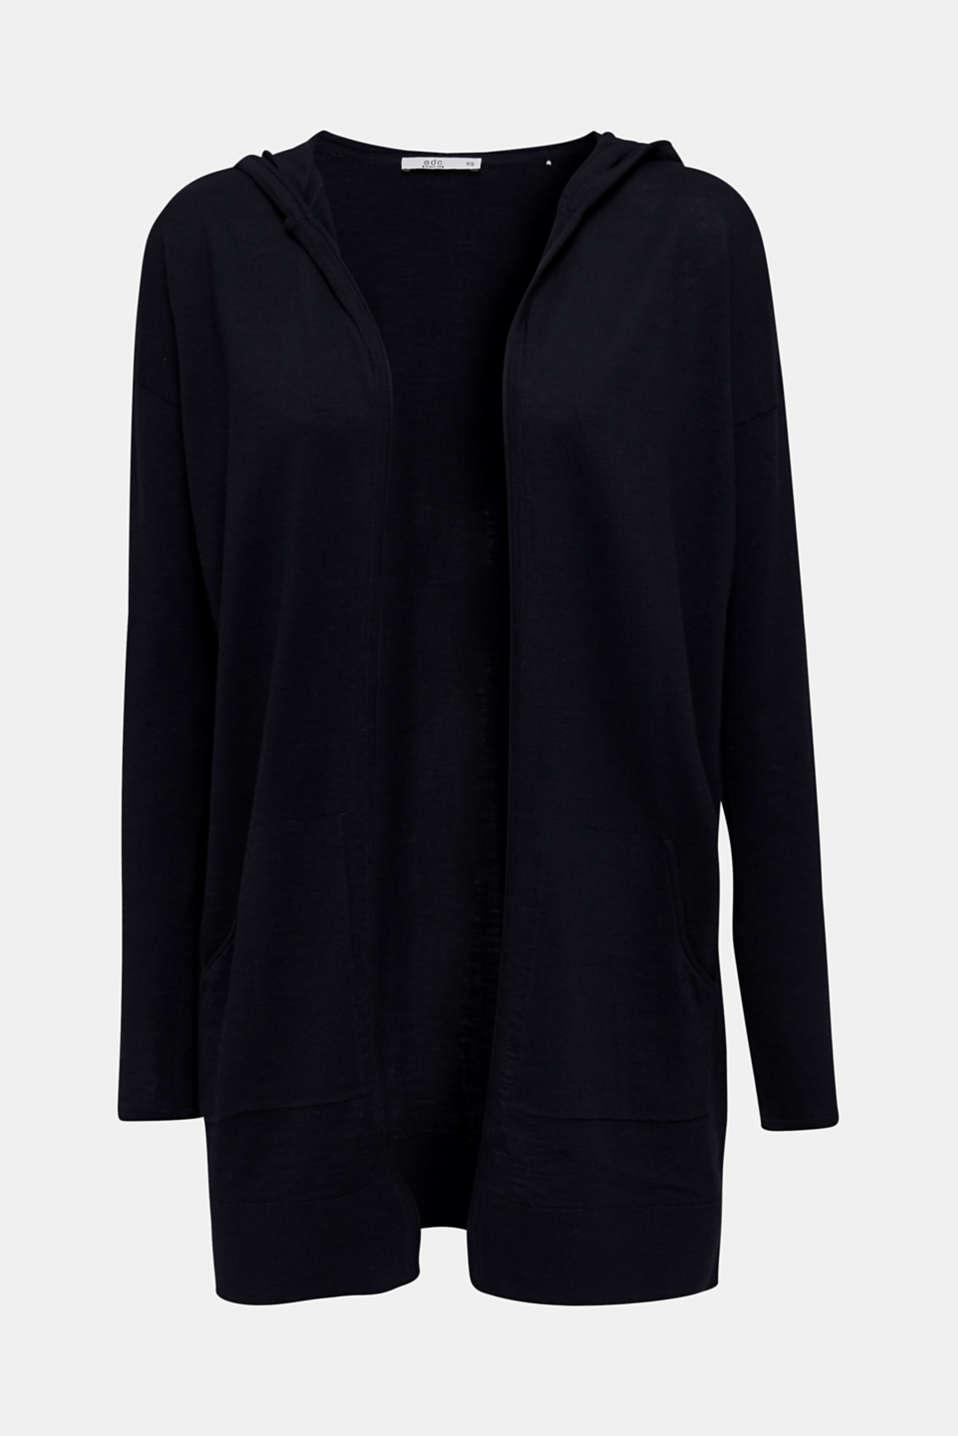 Cardigan, 100% cotton, NAVY, detail image number 7